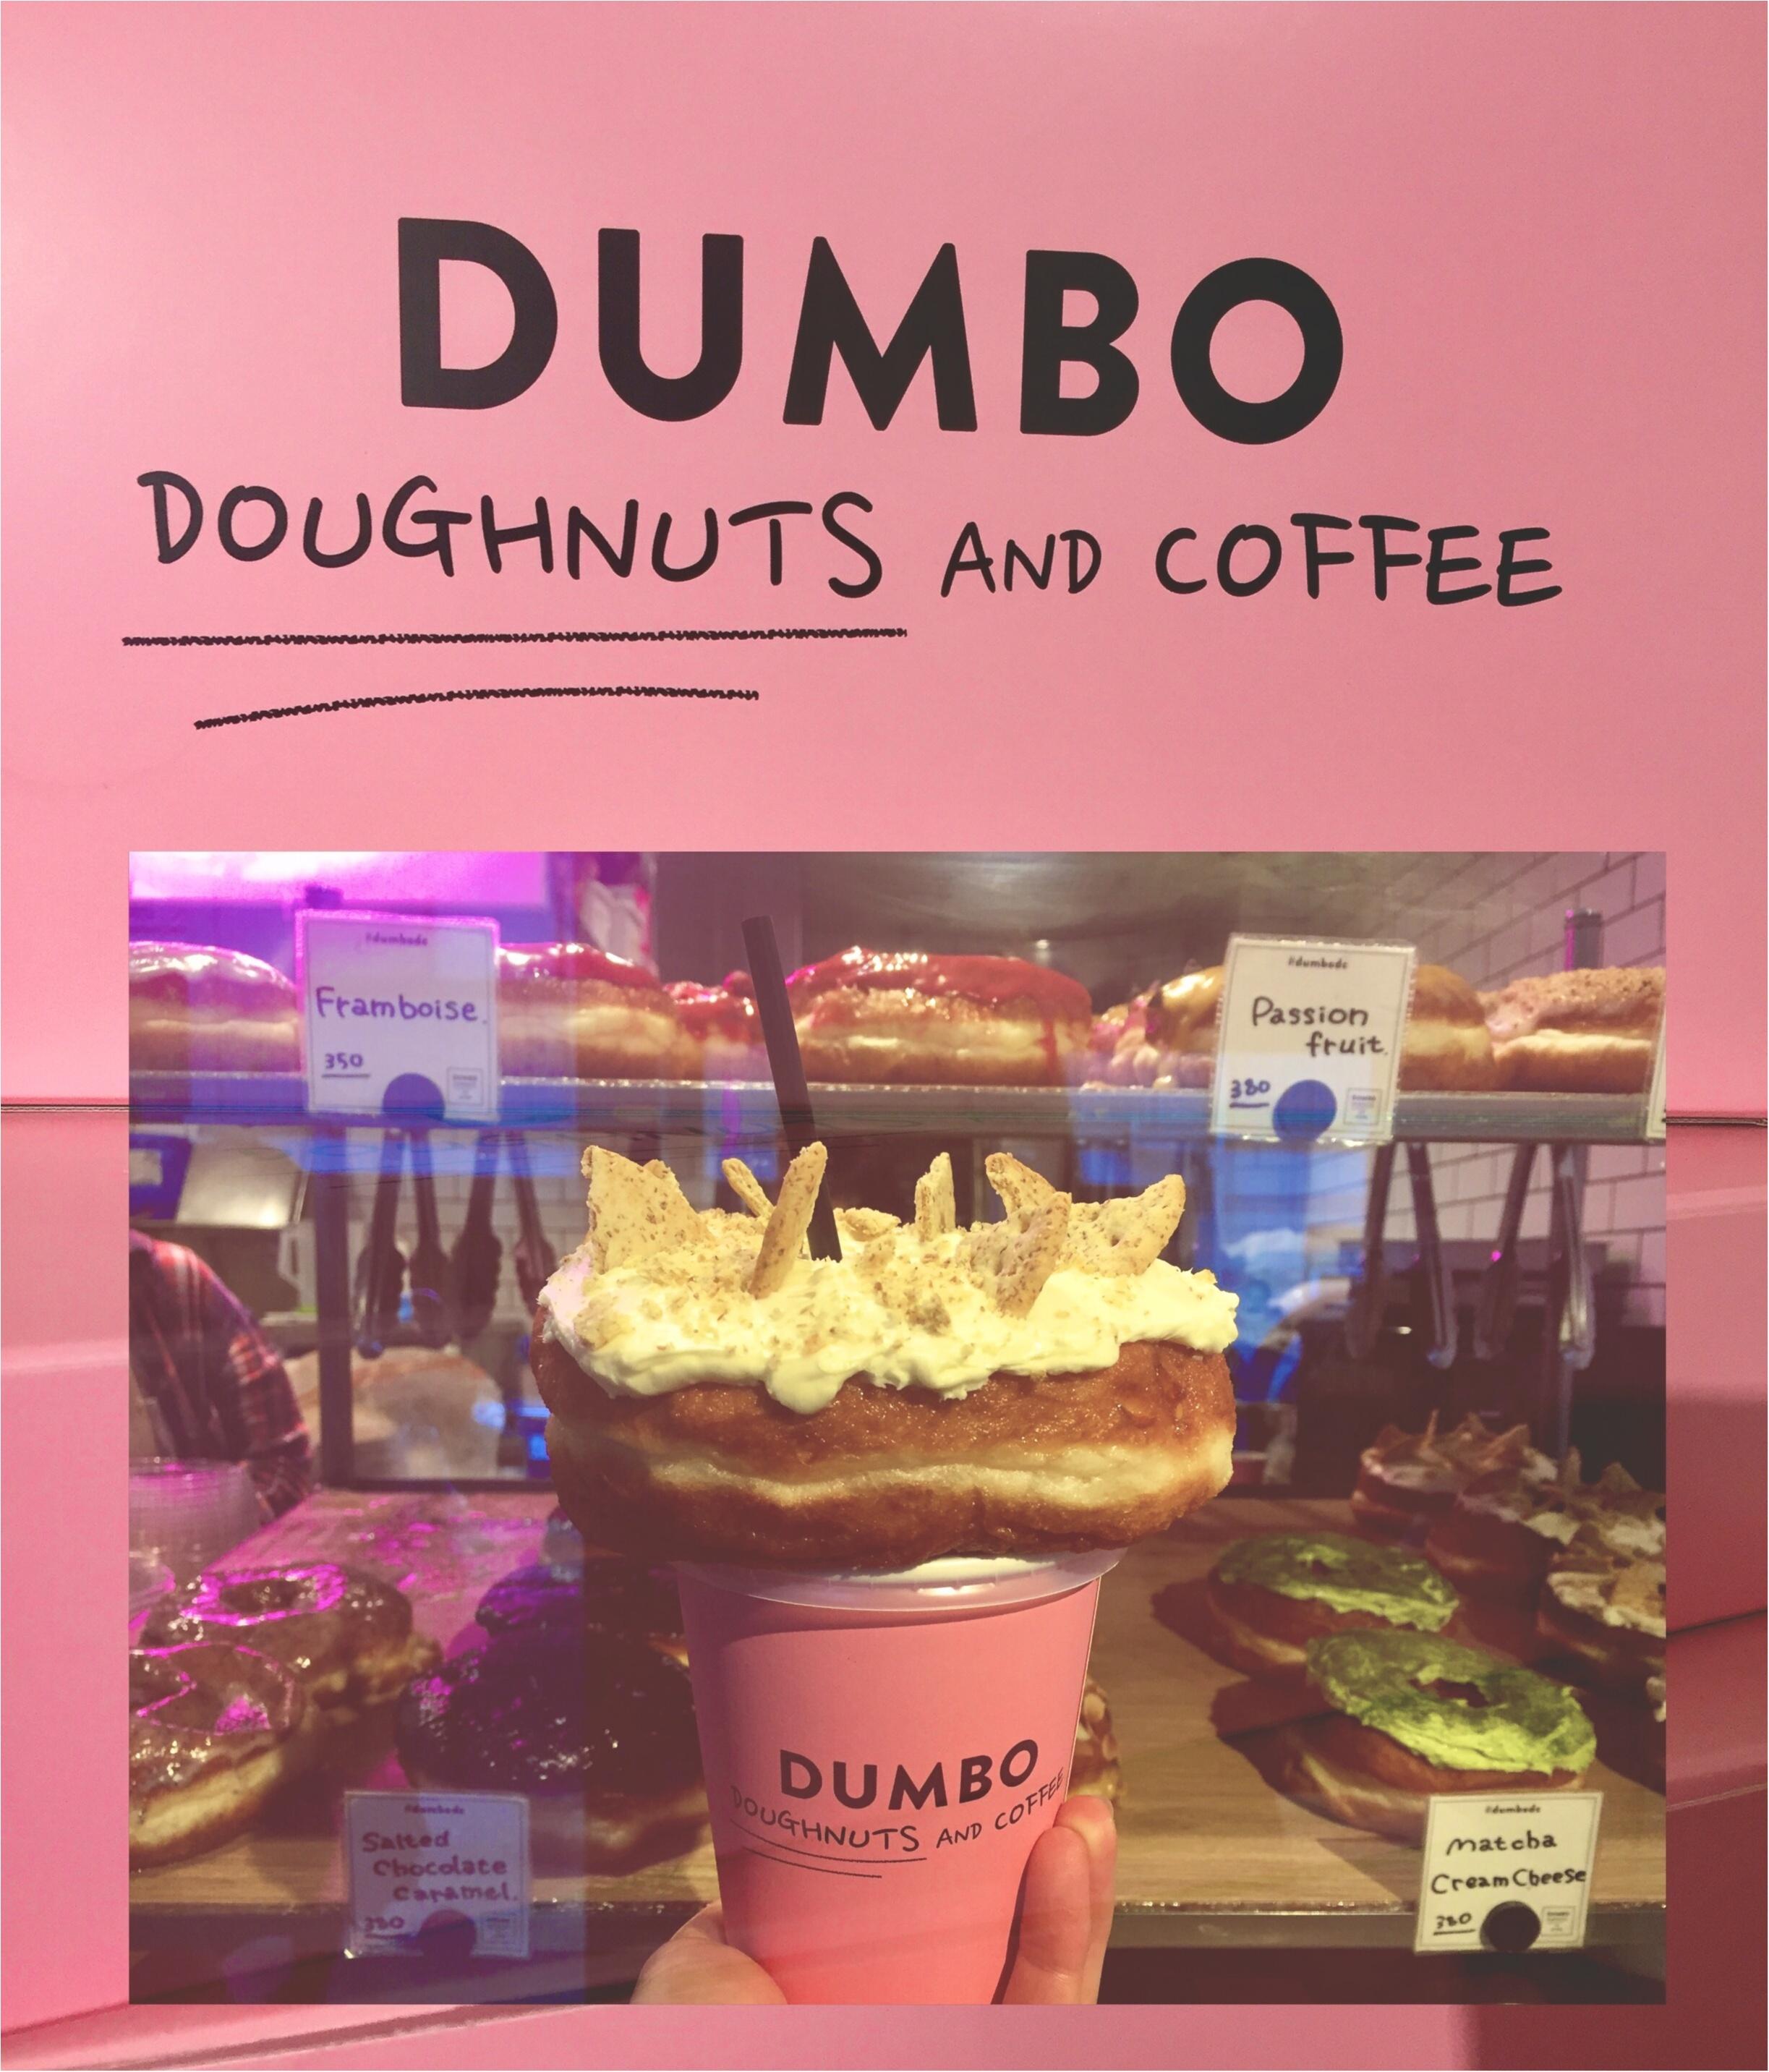 【FOOD】人気の理由を徹底解剖!おしゃれな人はみーんな行ってる♡DUMBO Doughnuts and Coffee♡_1